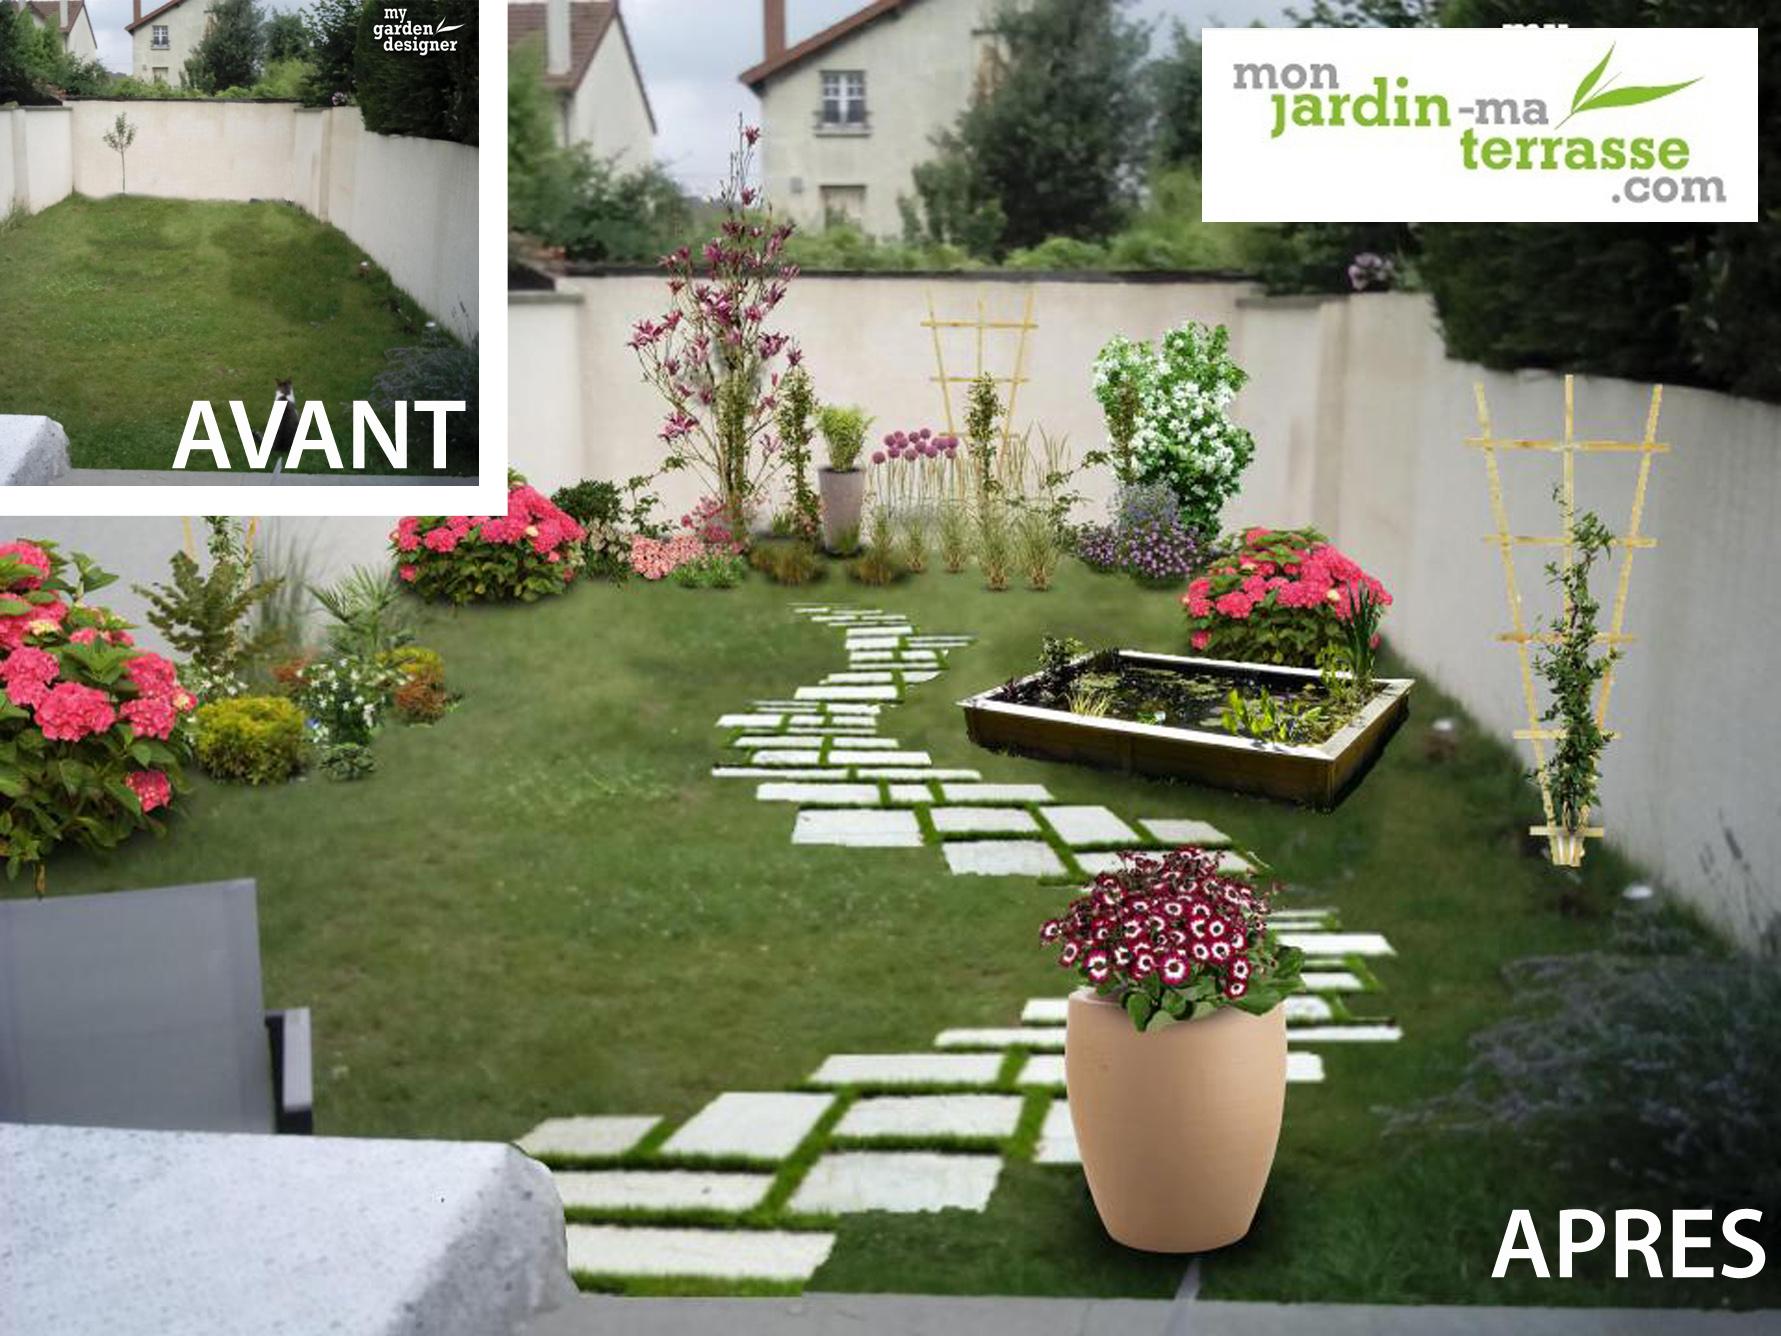 Awesome Amenager Un Rez De Jardin Photos - Ridgewayng.com ...